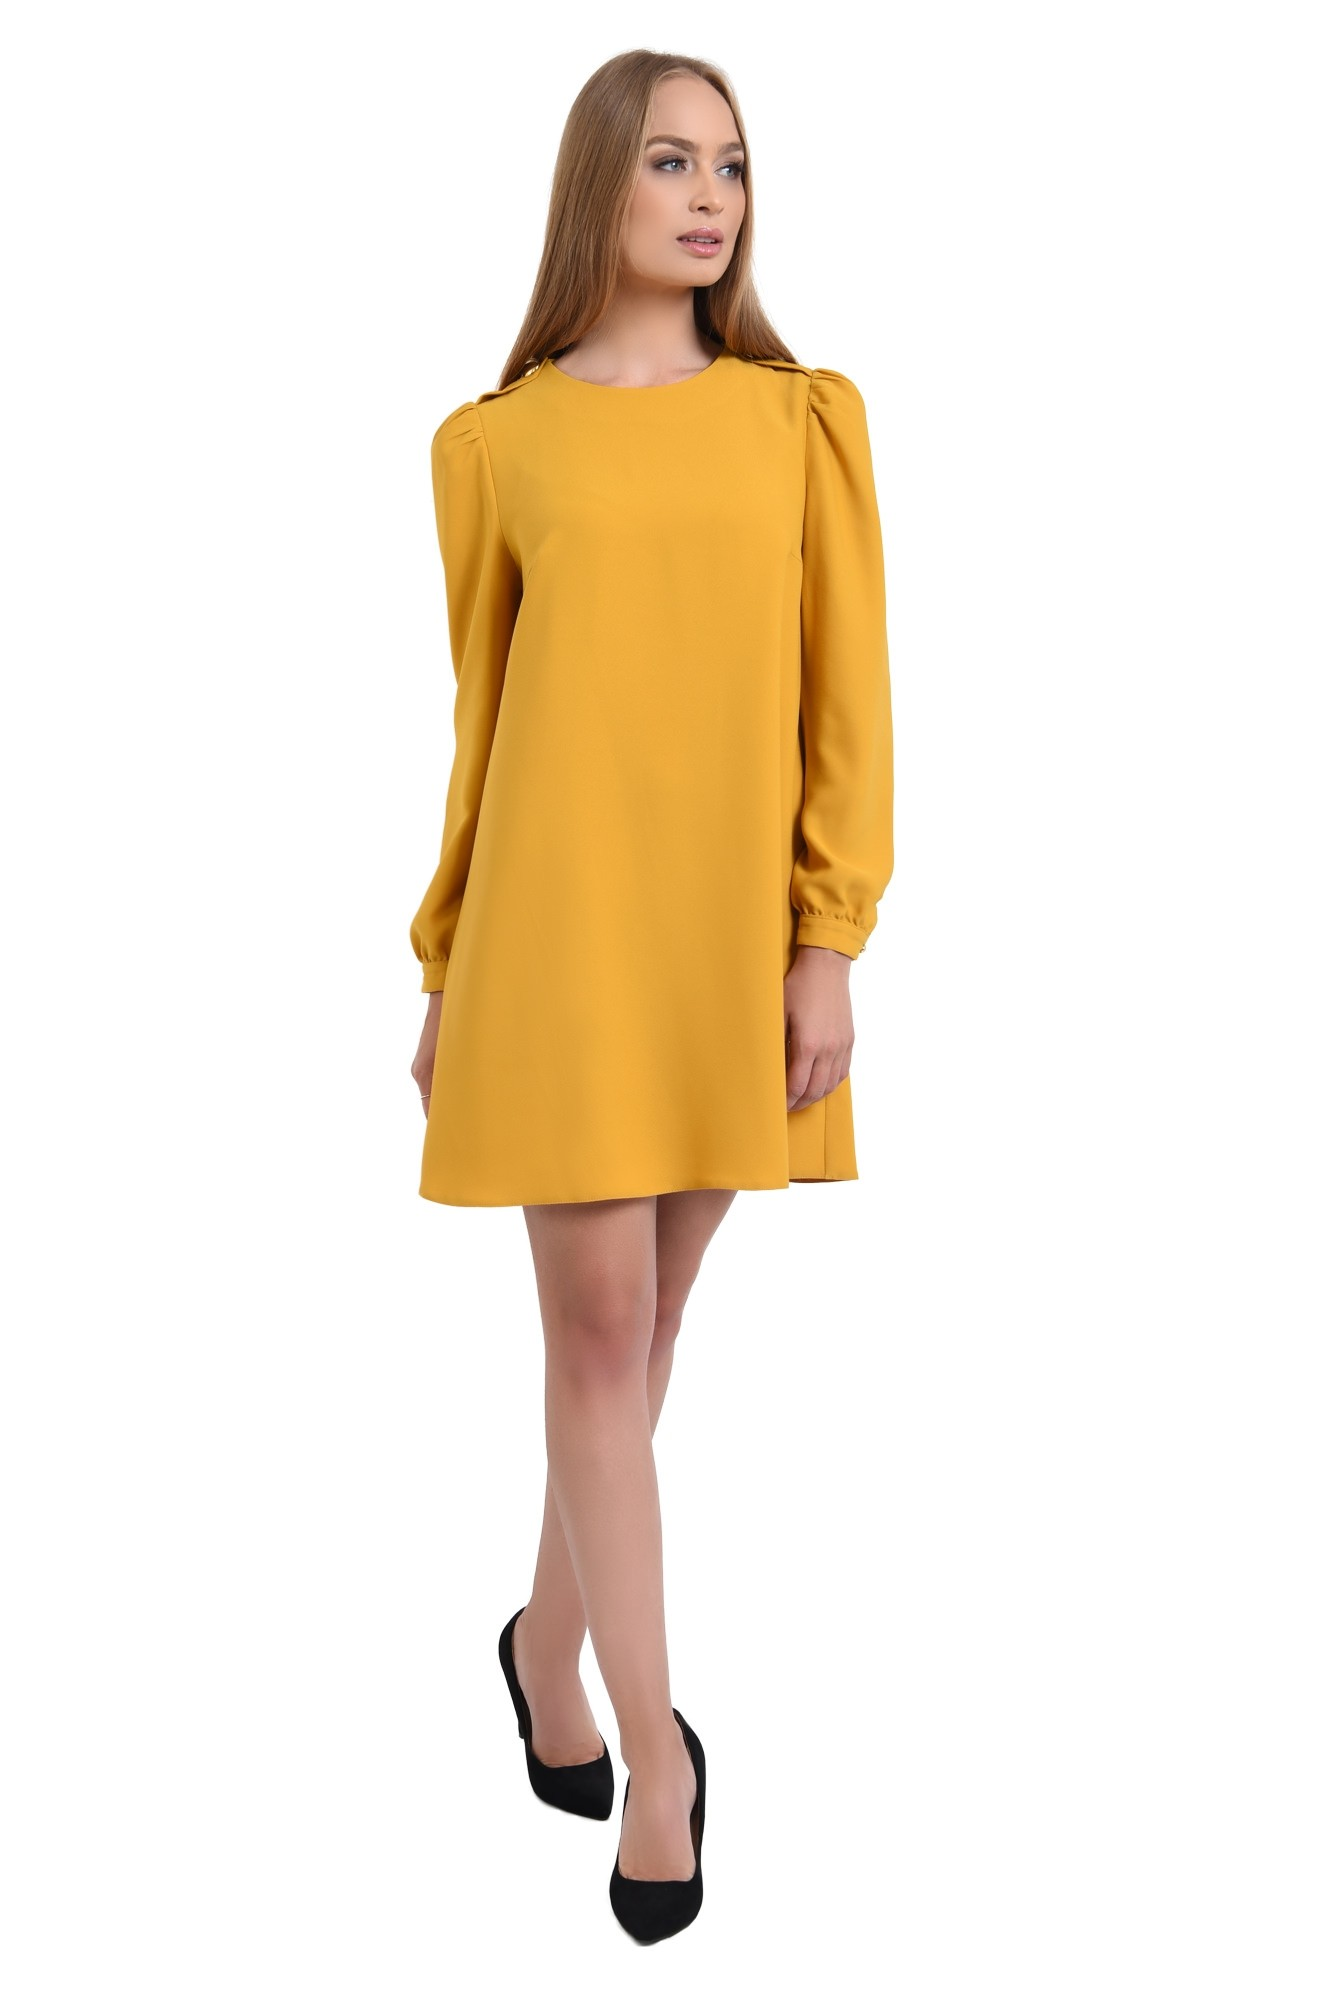 0 - rochie casual, scurta, mustar, evazata